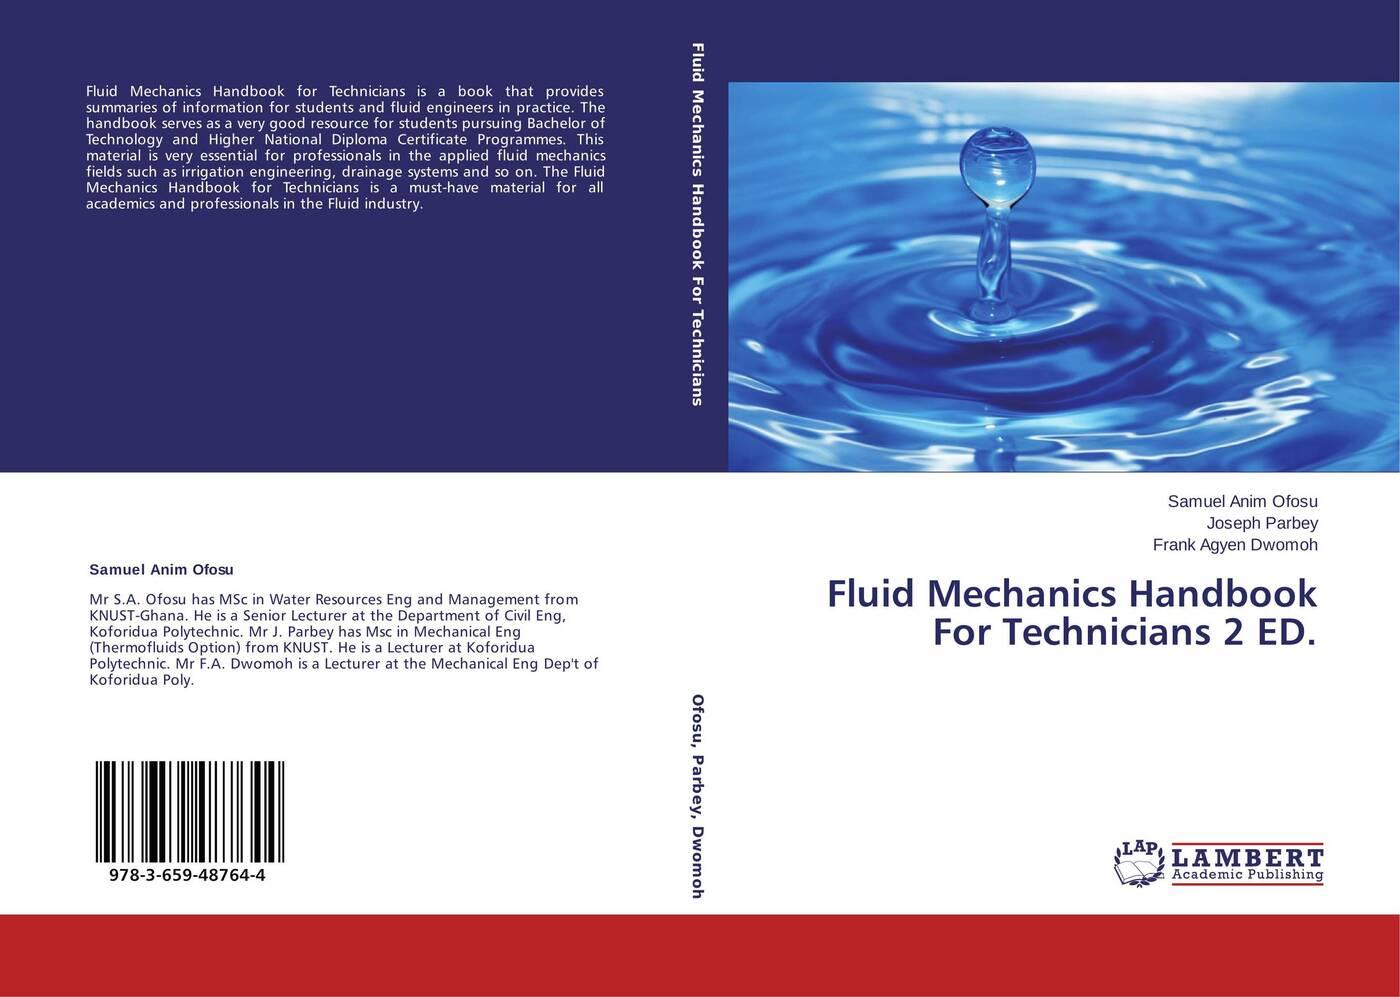 Samuel Anim Ofosu,Joseph Parbey and Frank Agyen Dwomoh Fluid Mechanics Handbook For Technicians 2 ED. alain boutier laser metrology in fluid mechanics granulometry temperature and concentration measurements